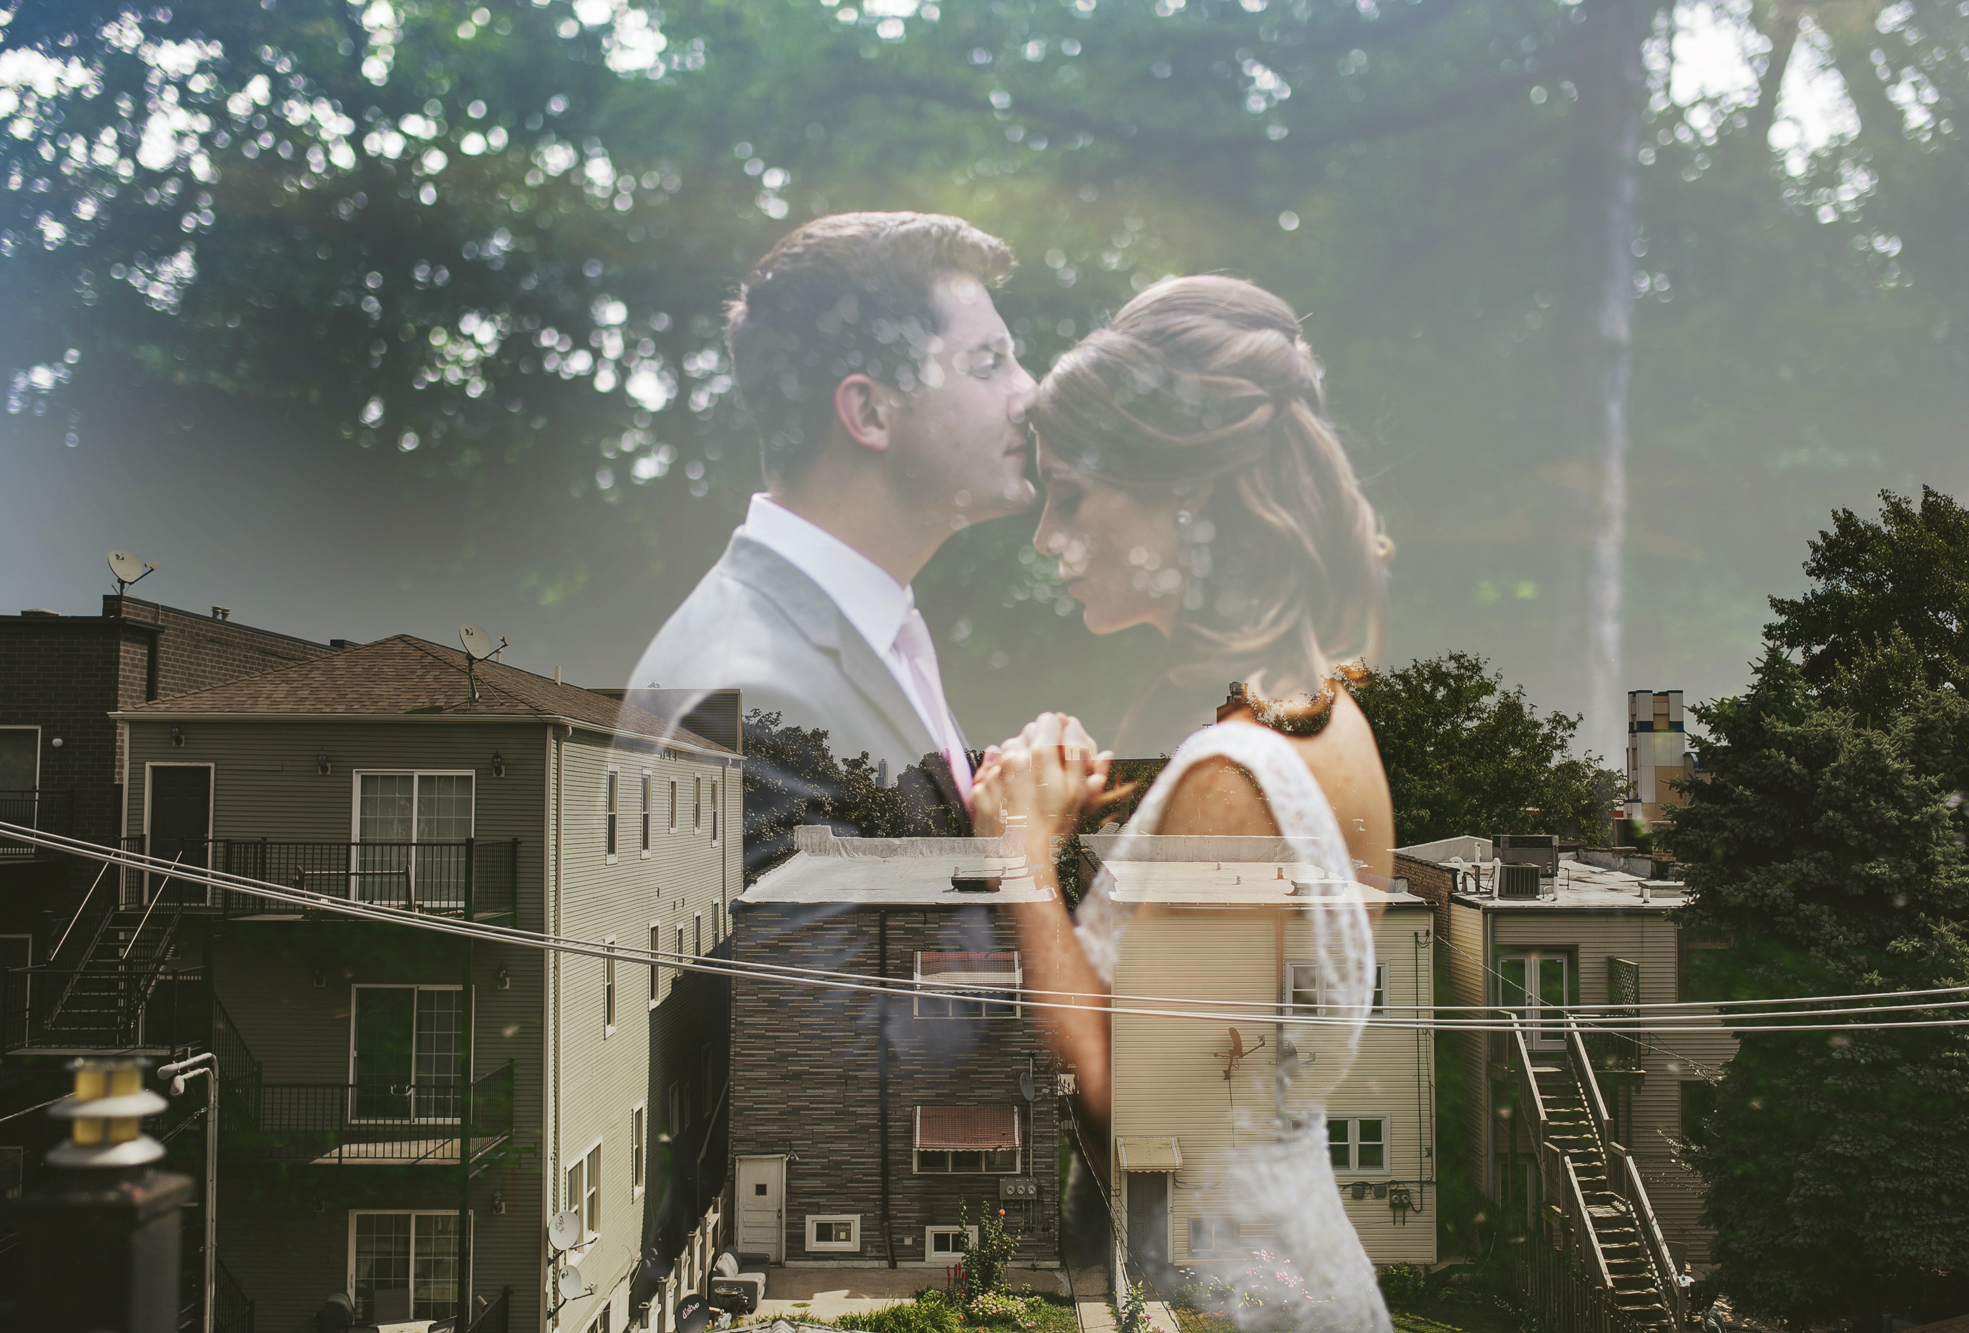 Brandon werth chicago wedding photographer double exposure